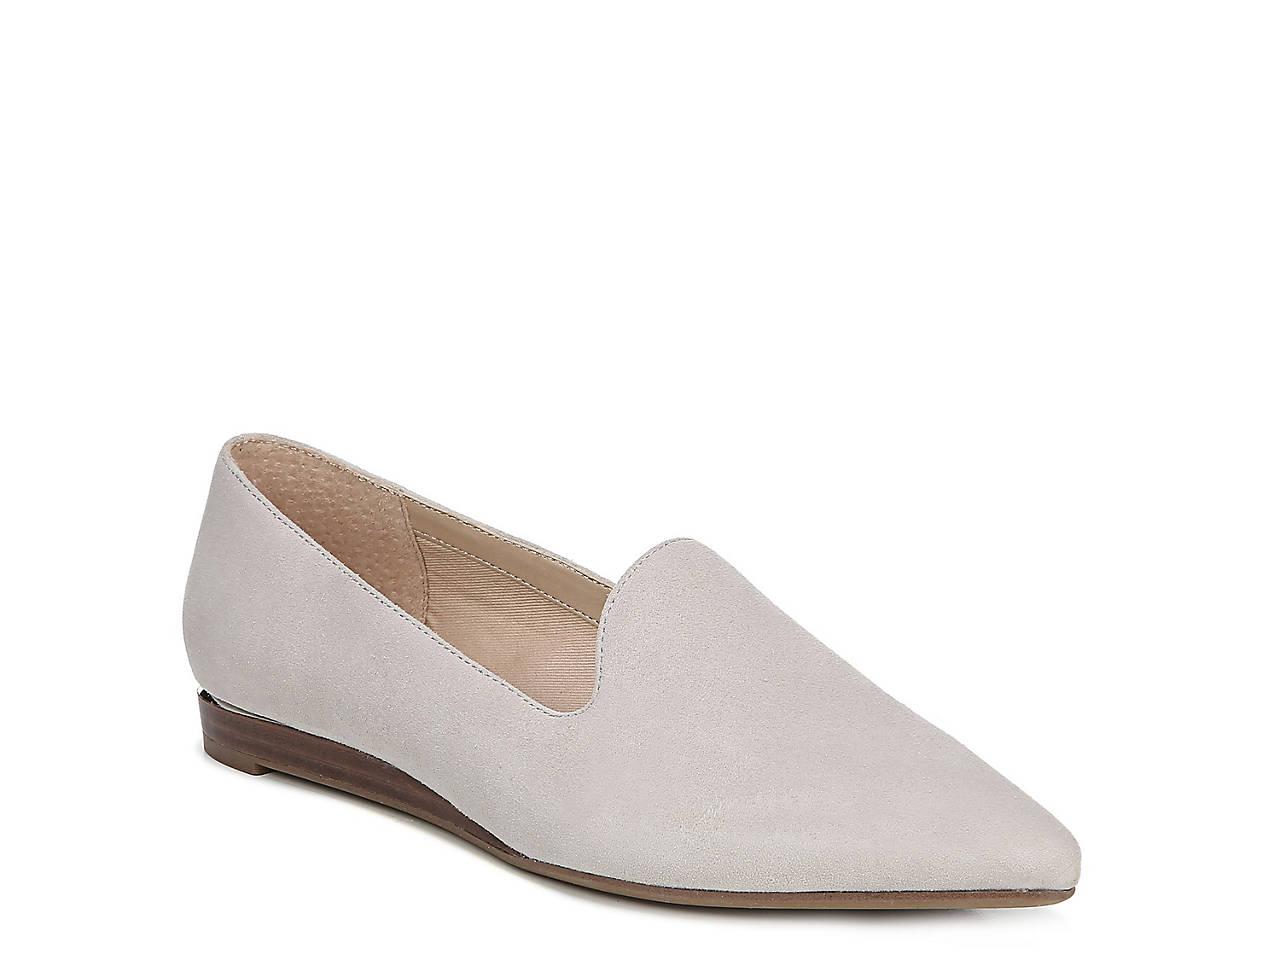 1f39cbab80 Franco Sarto Equinox Loafer Women's Shoes | DSW